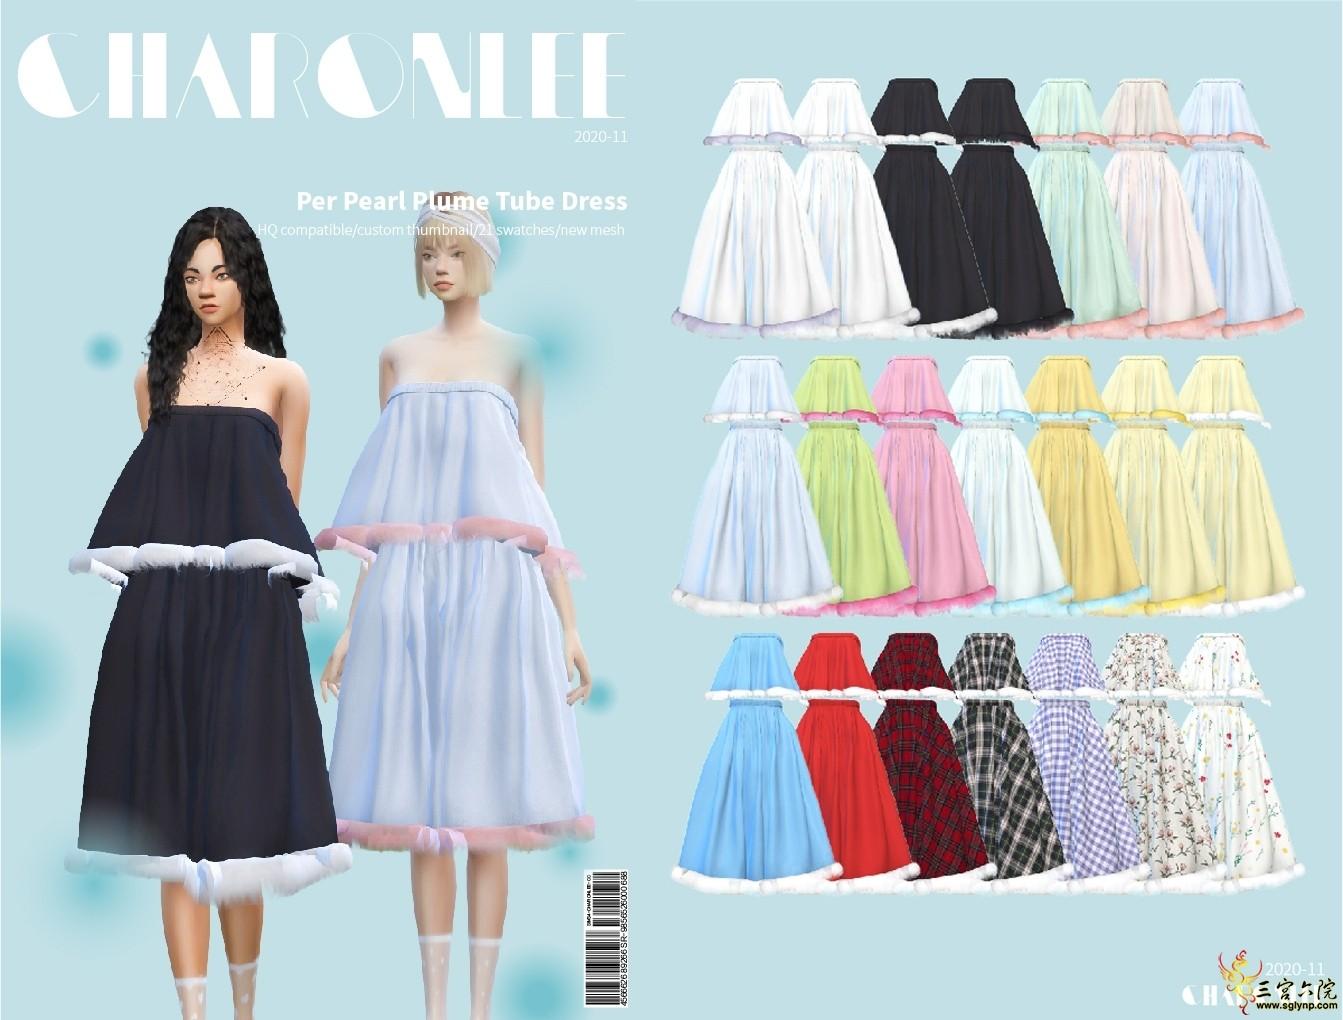 [CHARONLEE]2020-055-Per Pearl Plume Tube Dress.jpg